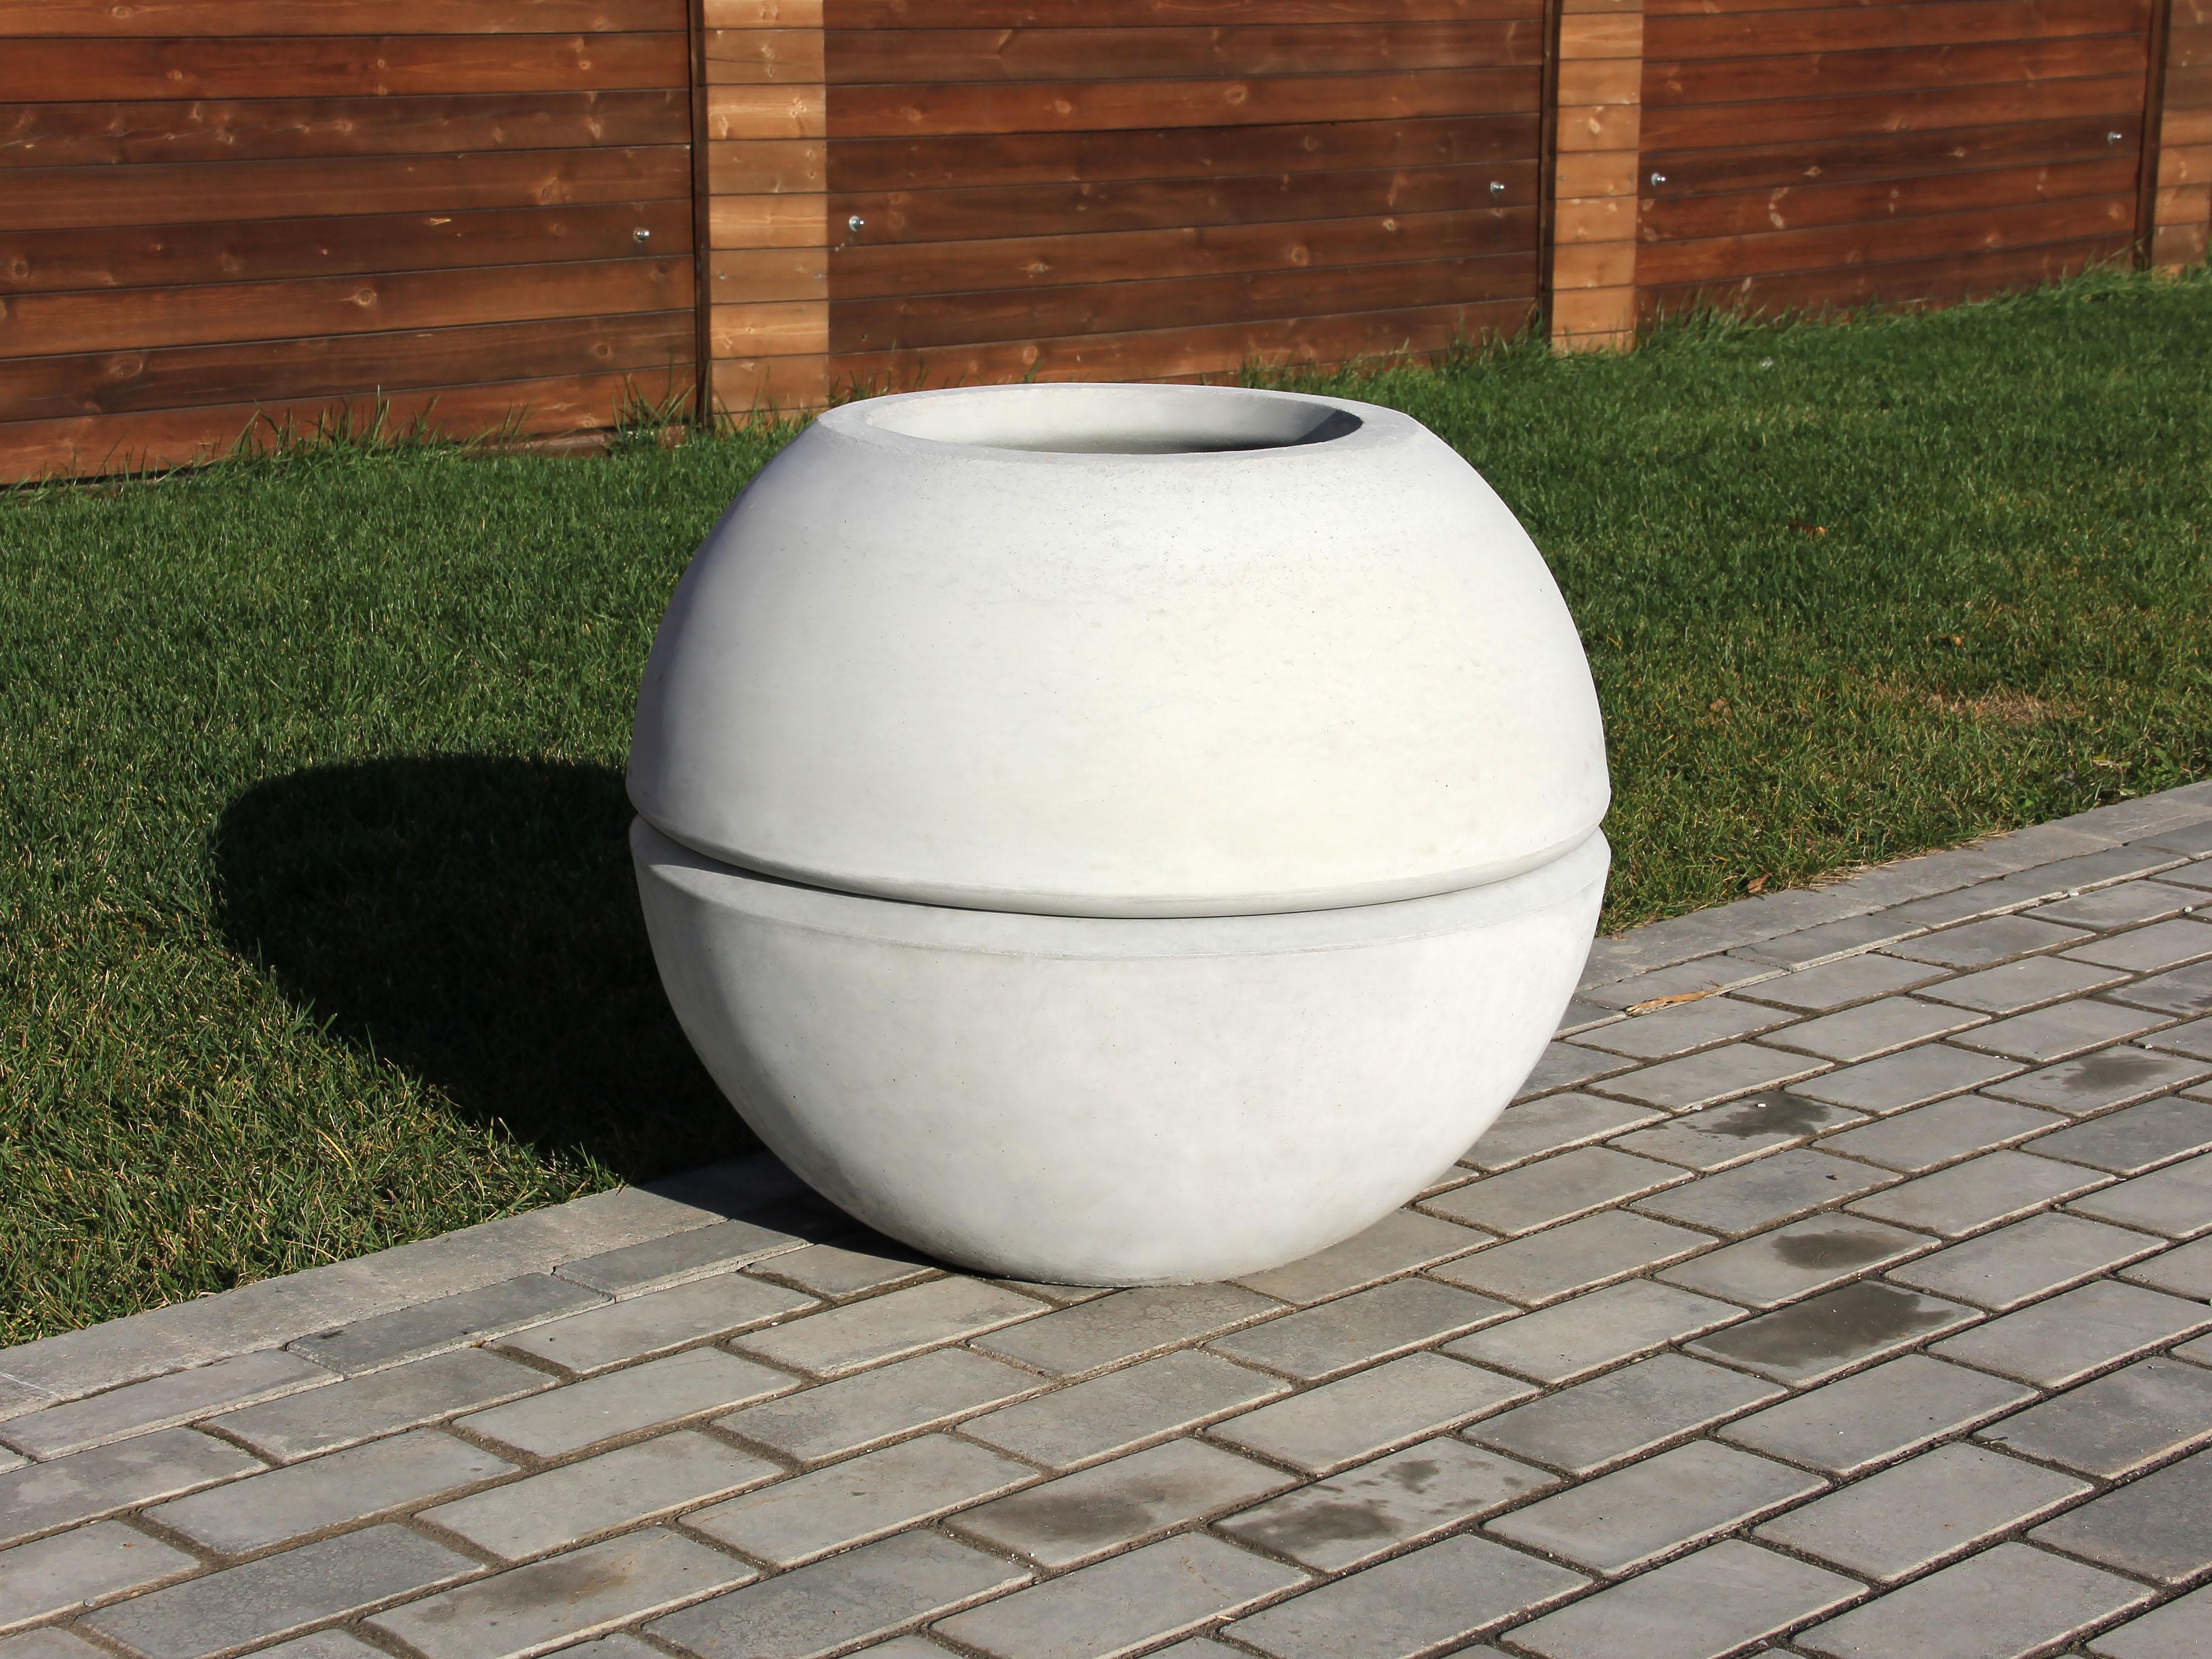 Арт бетон цветочницы маленький миксер бетон москва